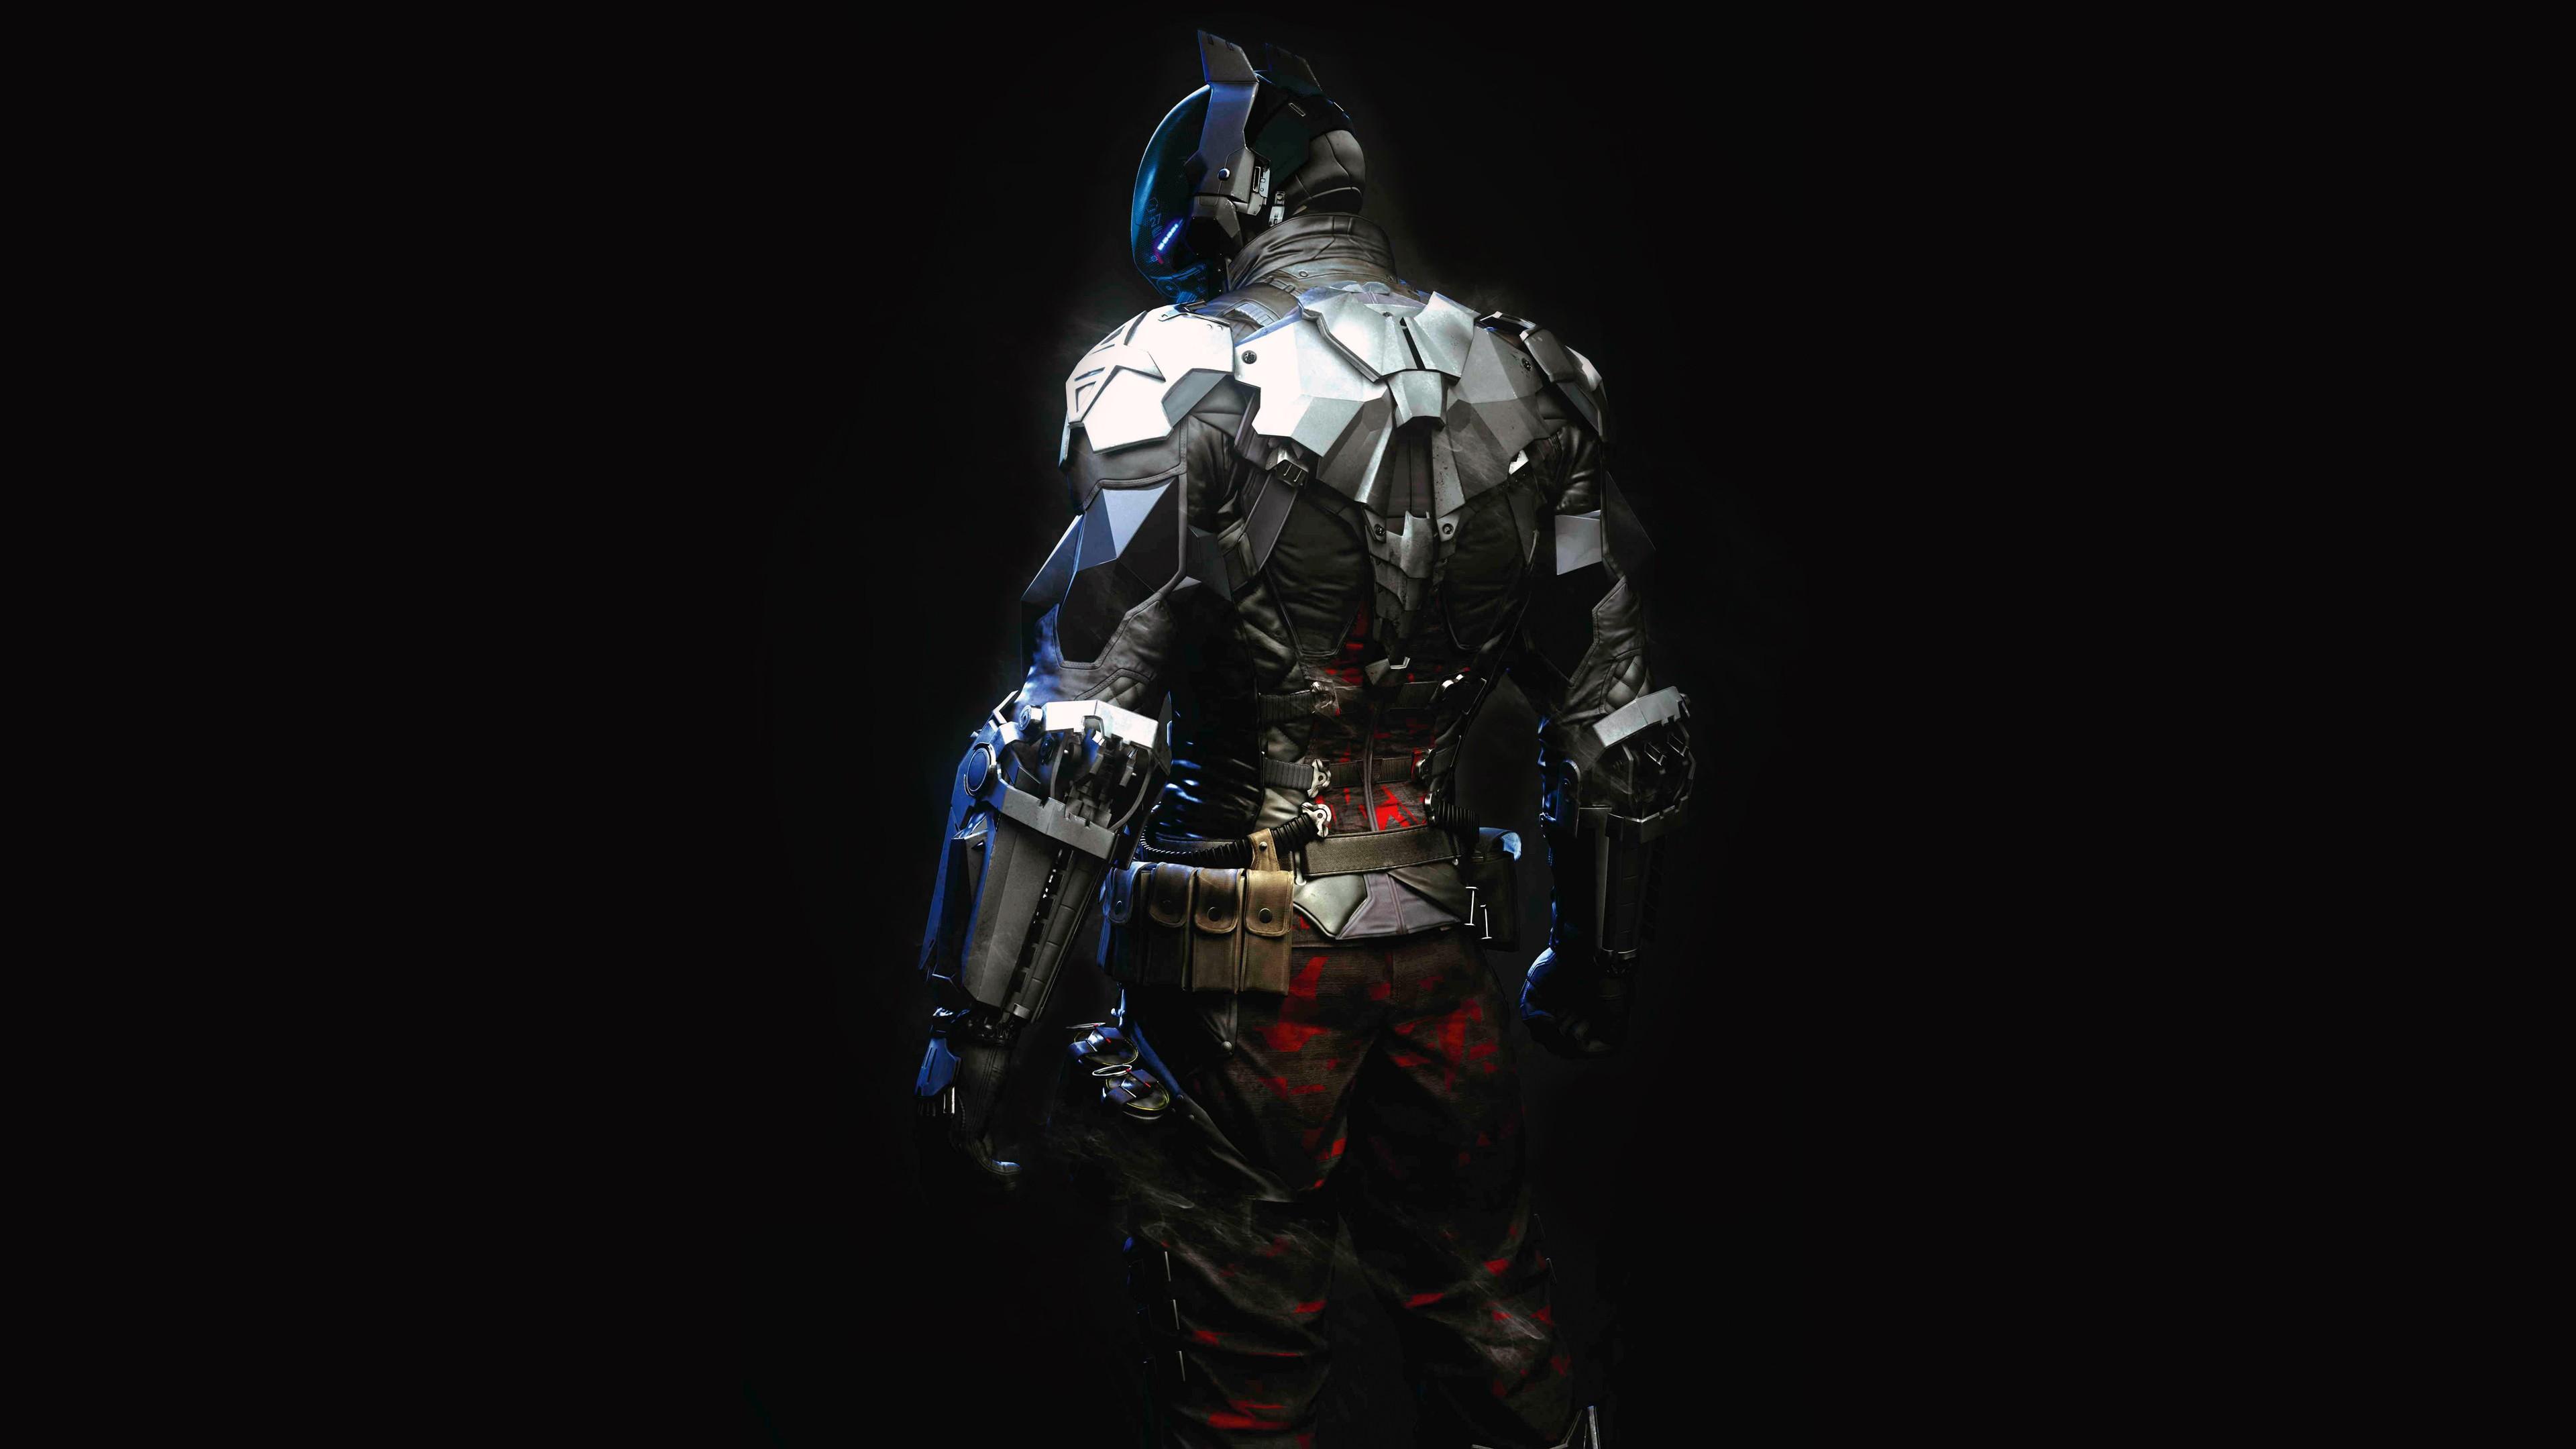 how to get batman arkham city for free mac